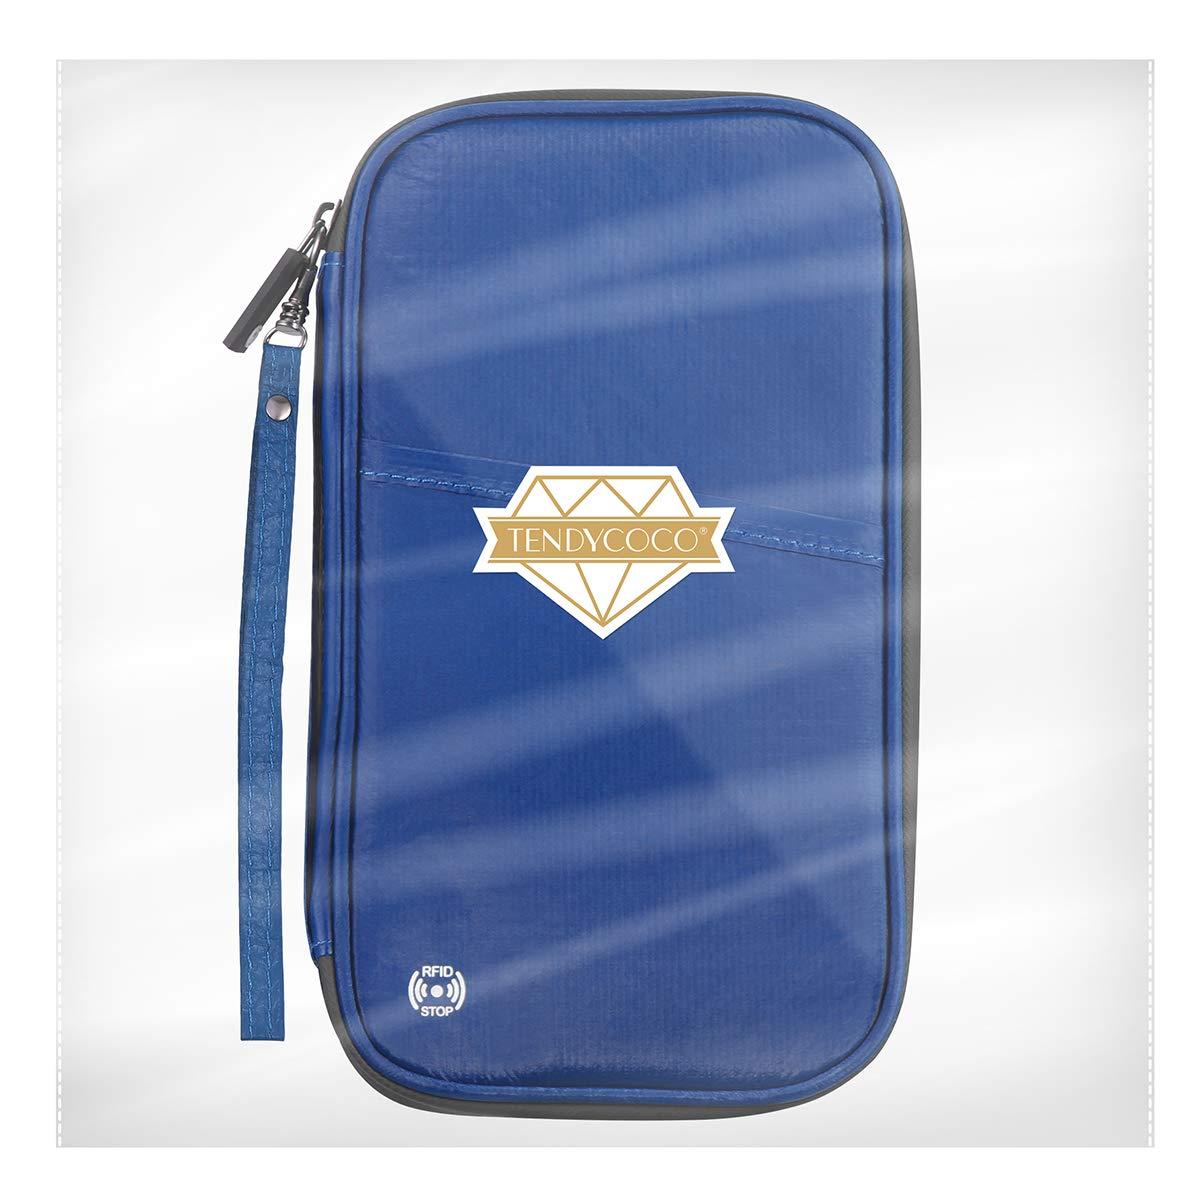 c03957513e60 TENDYCOCO Passport Wallet Family RFID Blocking Travel Wallet ...